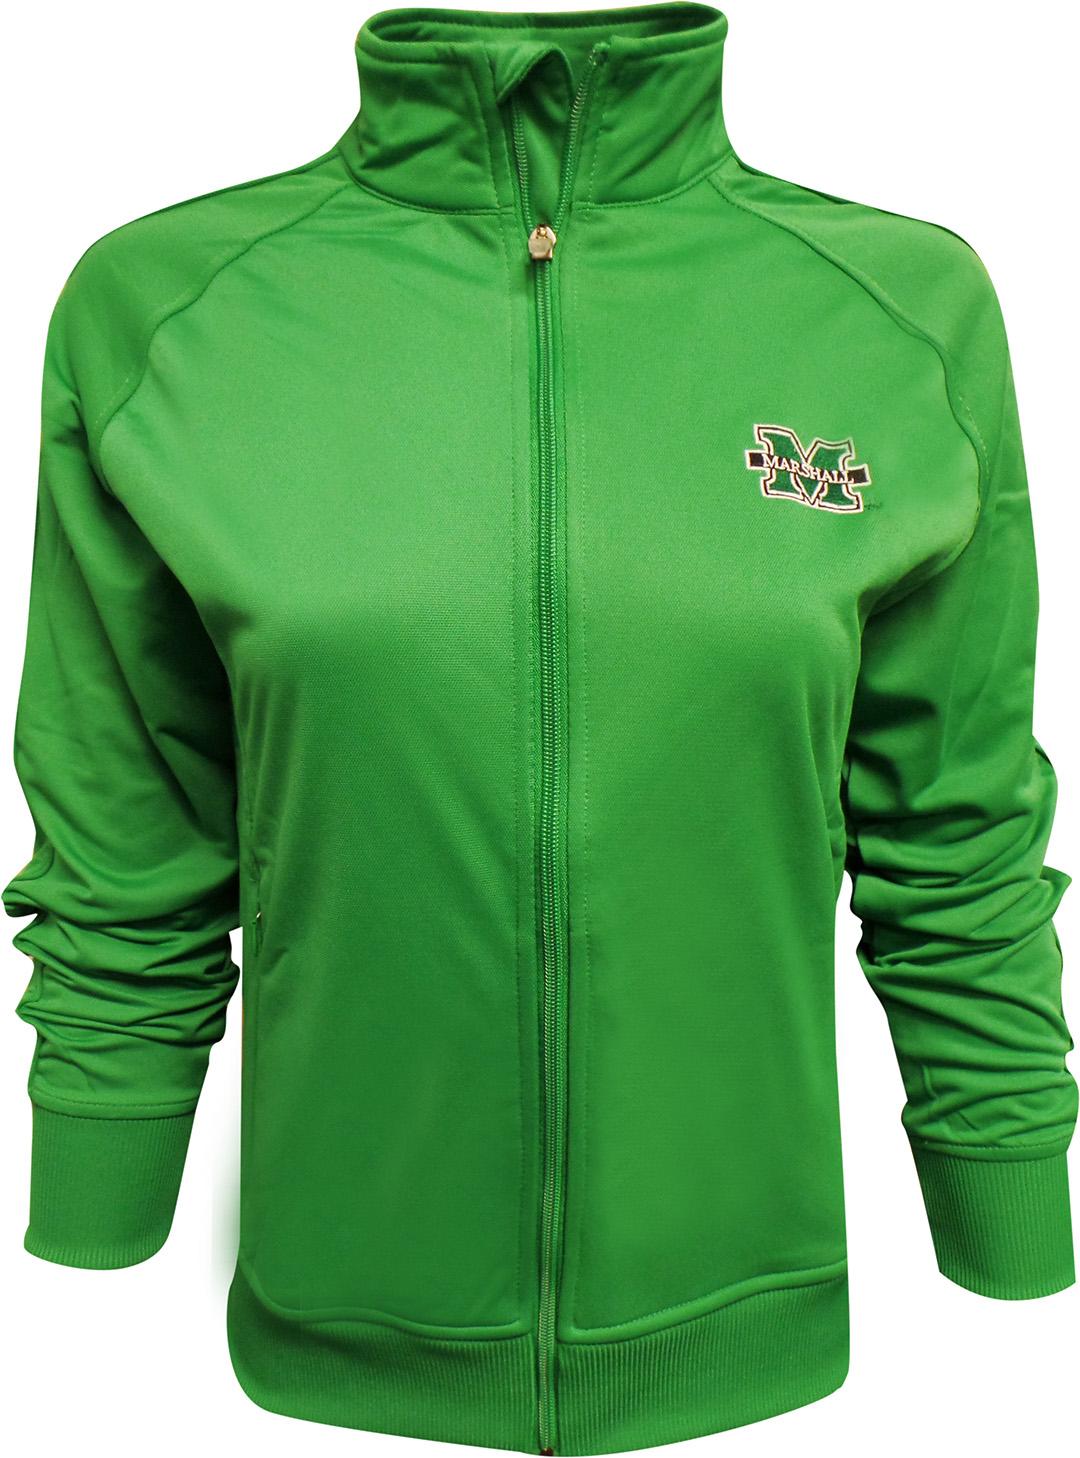 1490 <br> MU Venture FZ Jacket <br> SALE $34.99